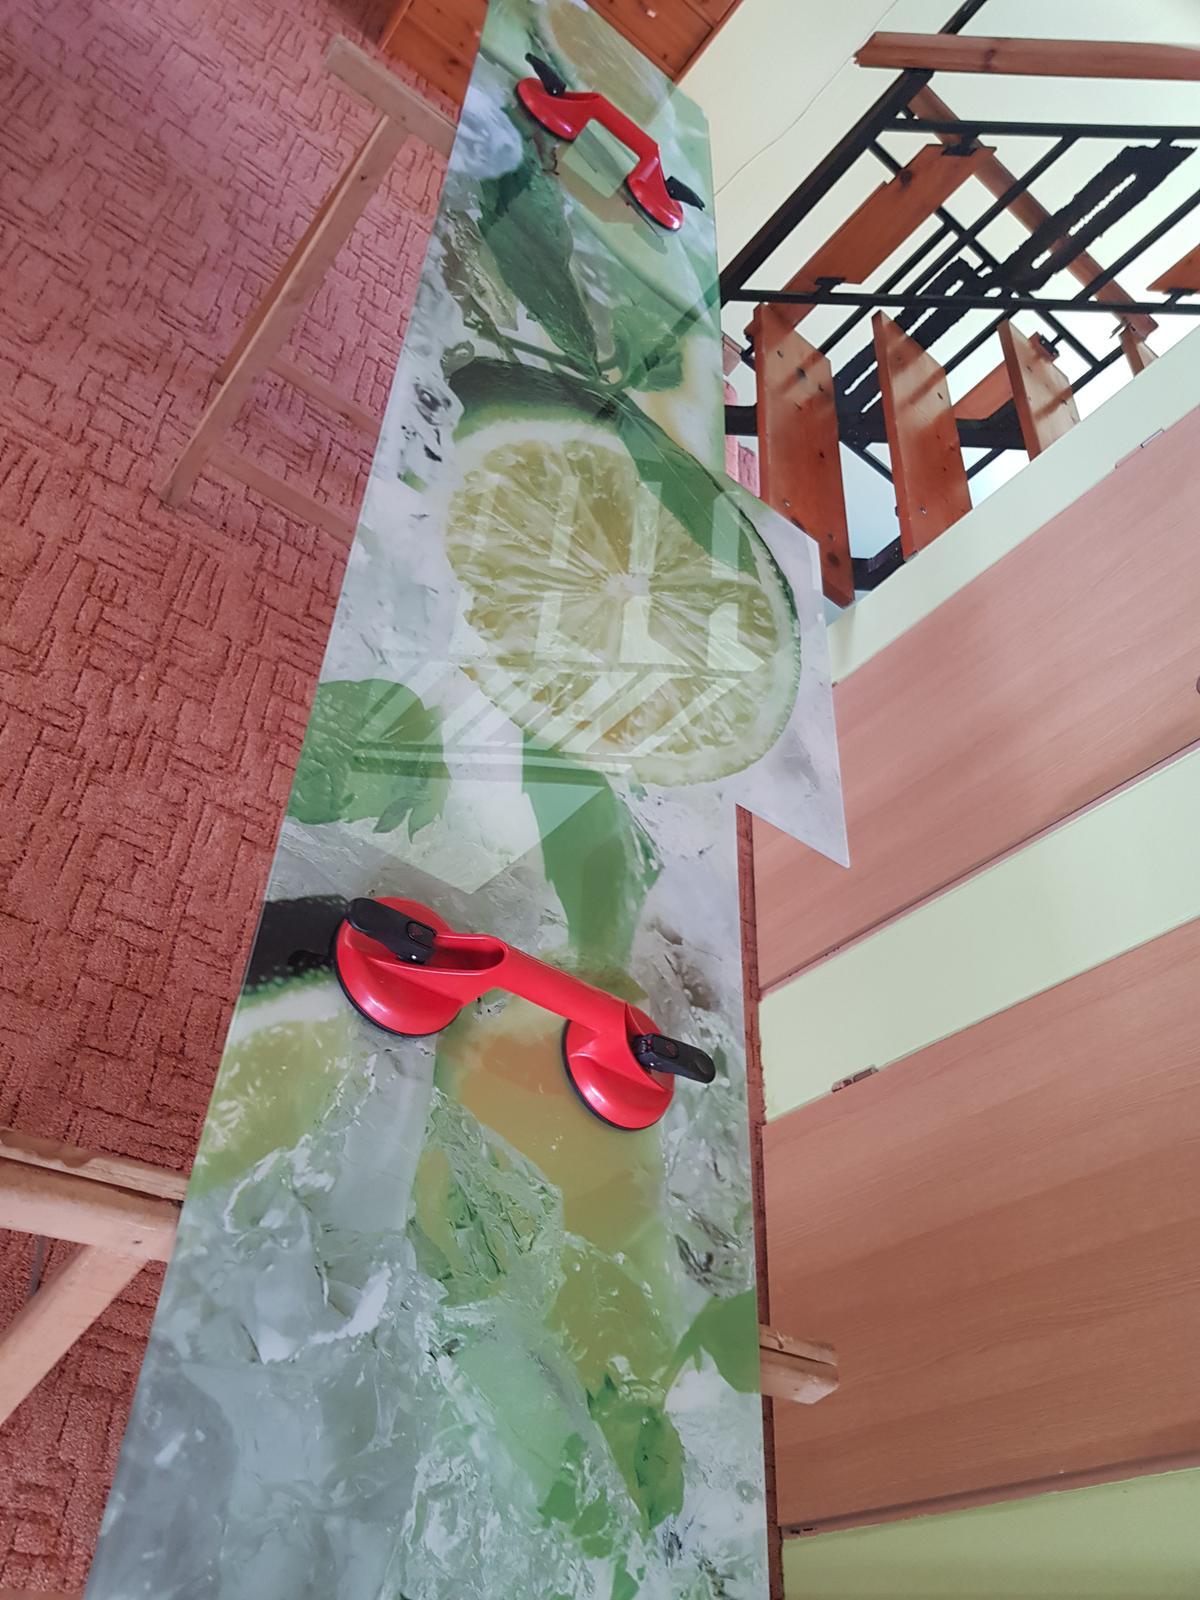 Dodávka a montáž sklenenej zásteny s motívom (Bučany). - Obrázok č. 3